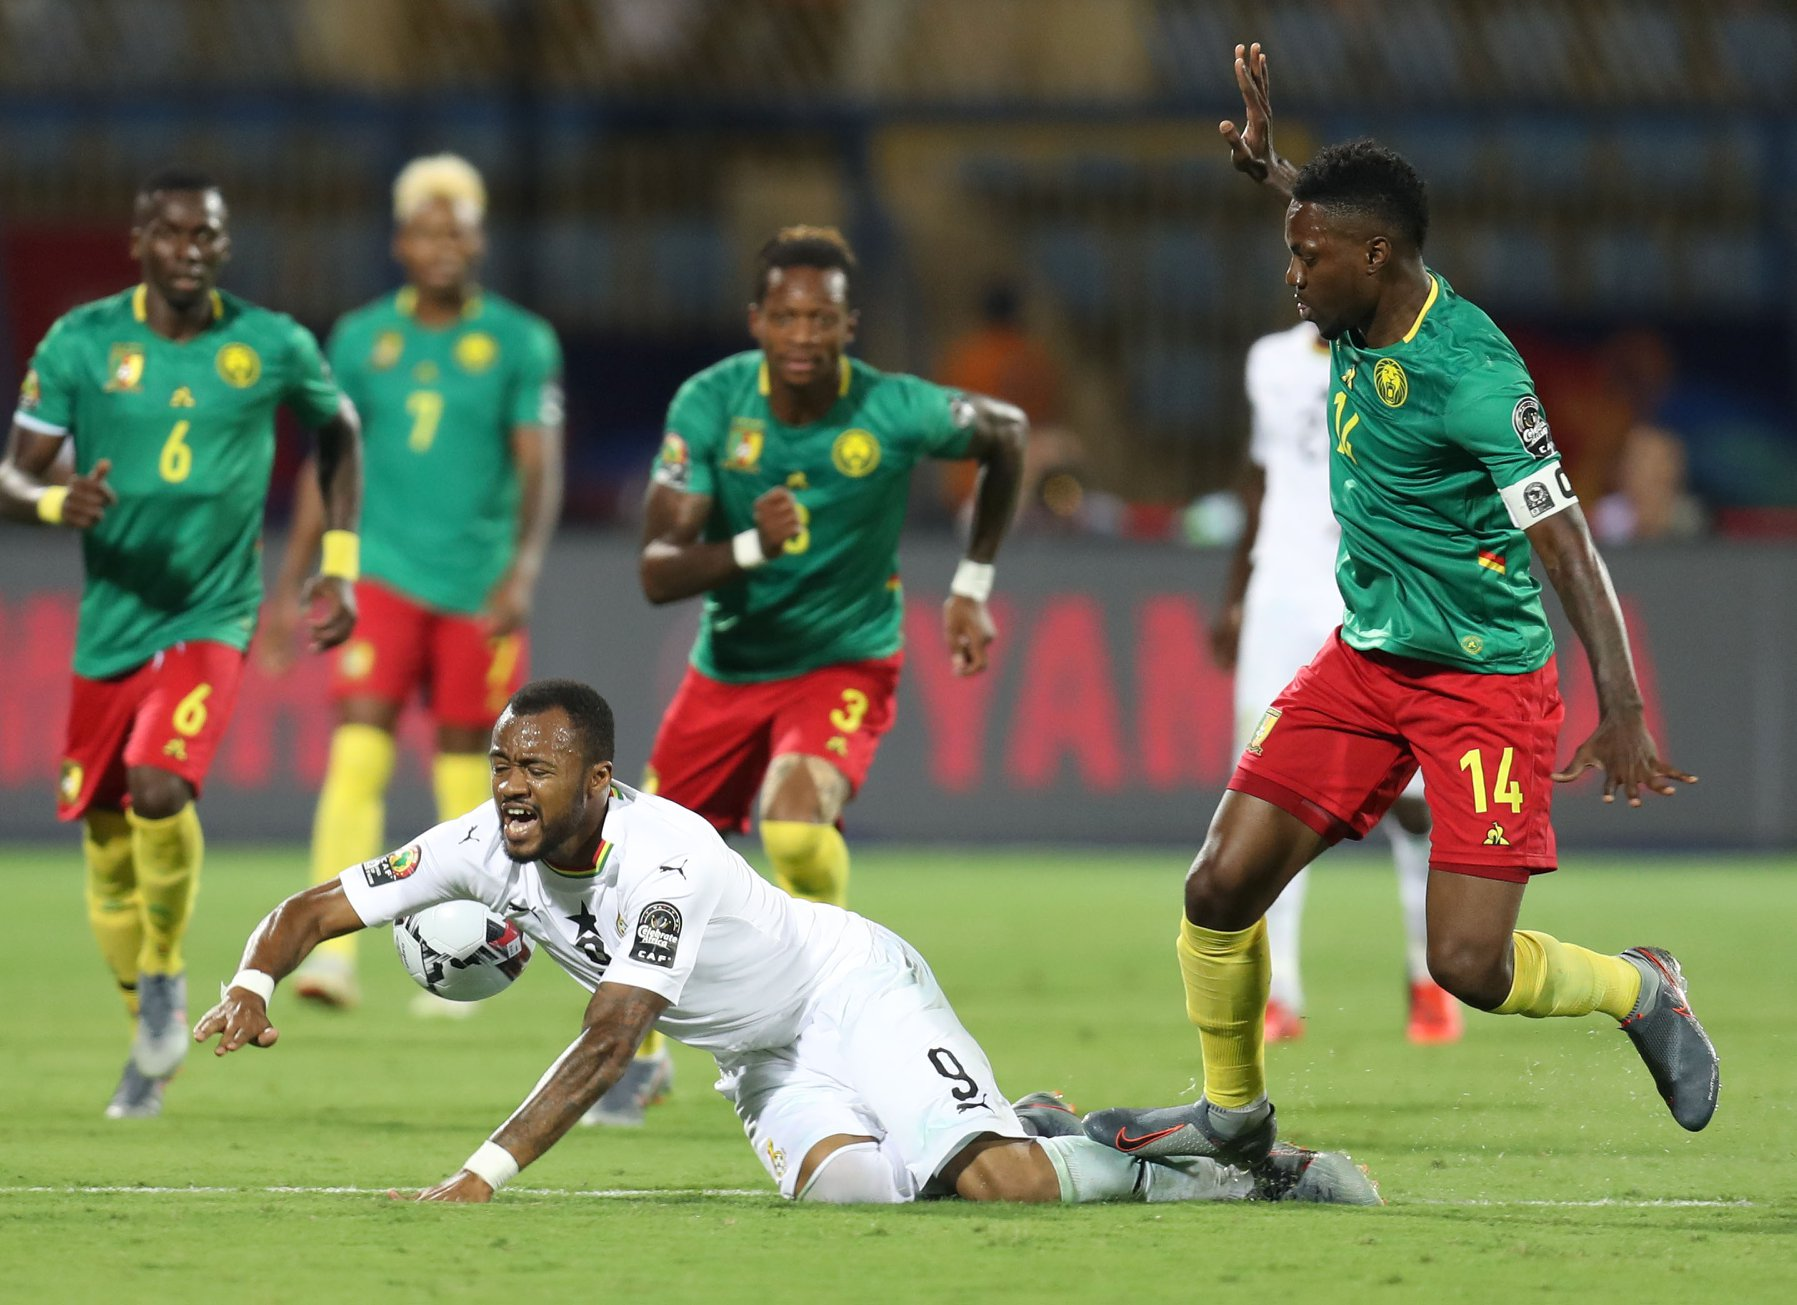 Prognoza za Benin-Kamerun Betinum.com